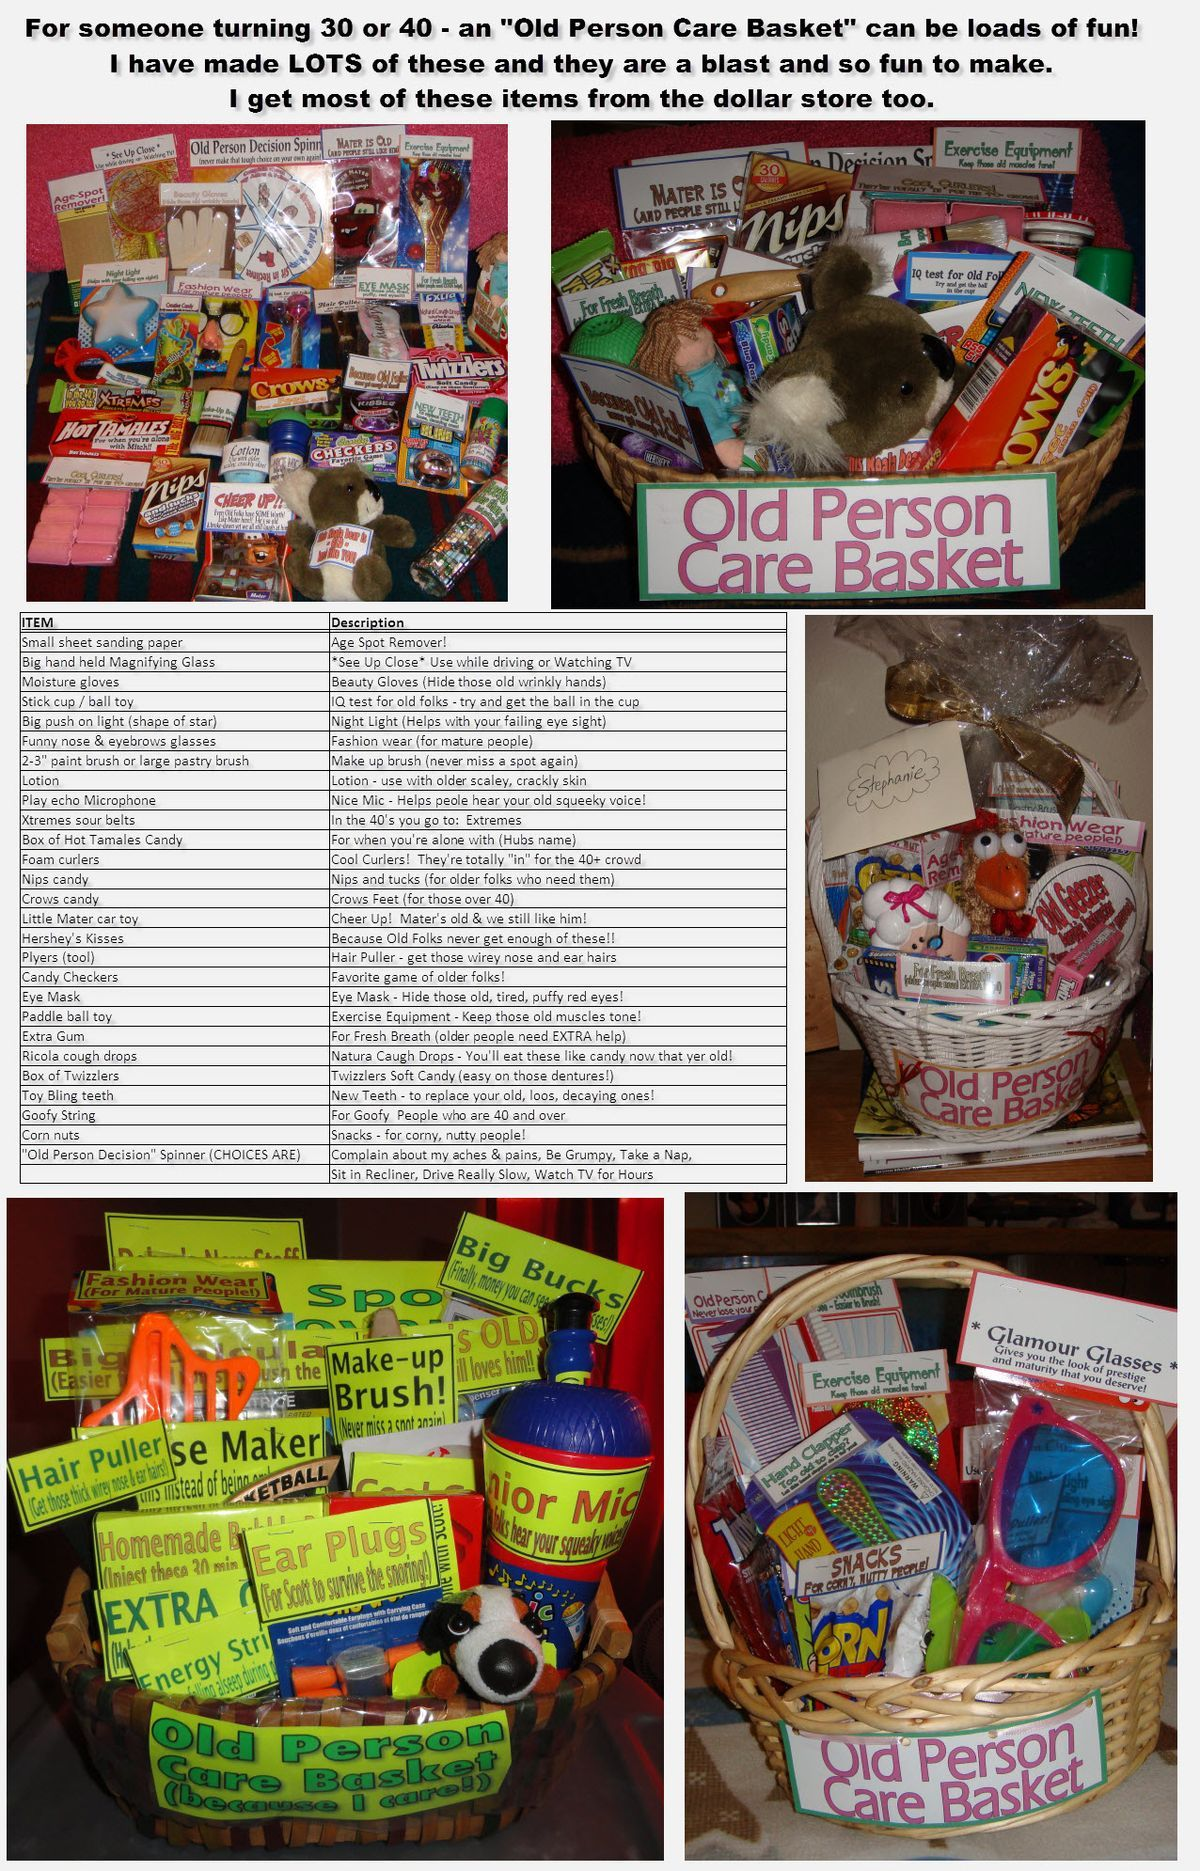 255dc304e4be1d00c28e7e7208f2e7aa 1200x1871 Pixels Birthday Gifts For Boyfriend Homemade